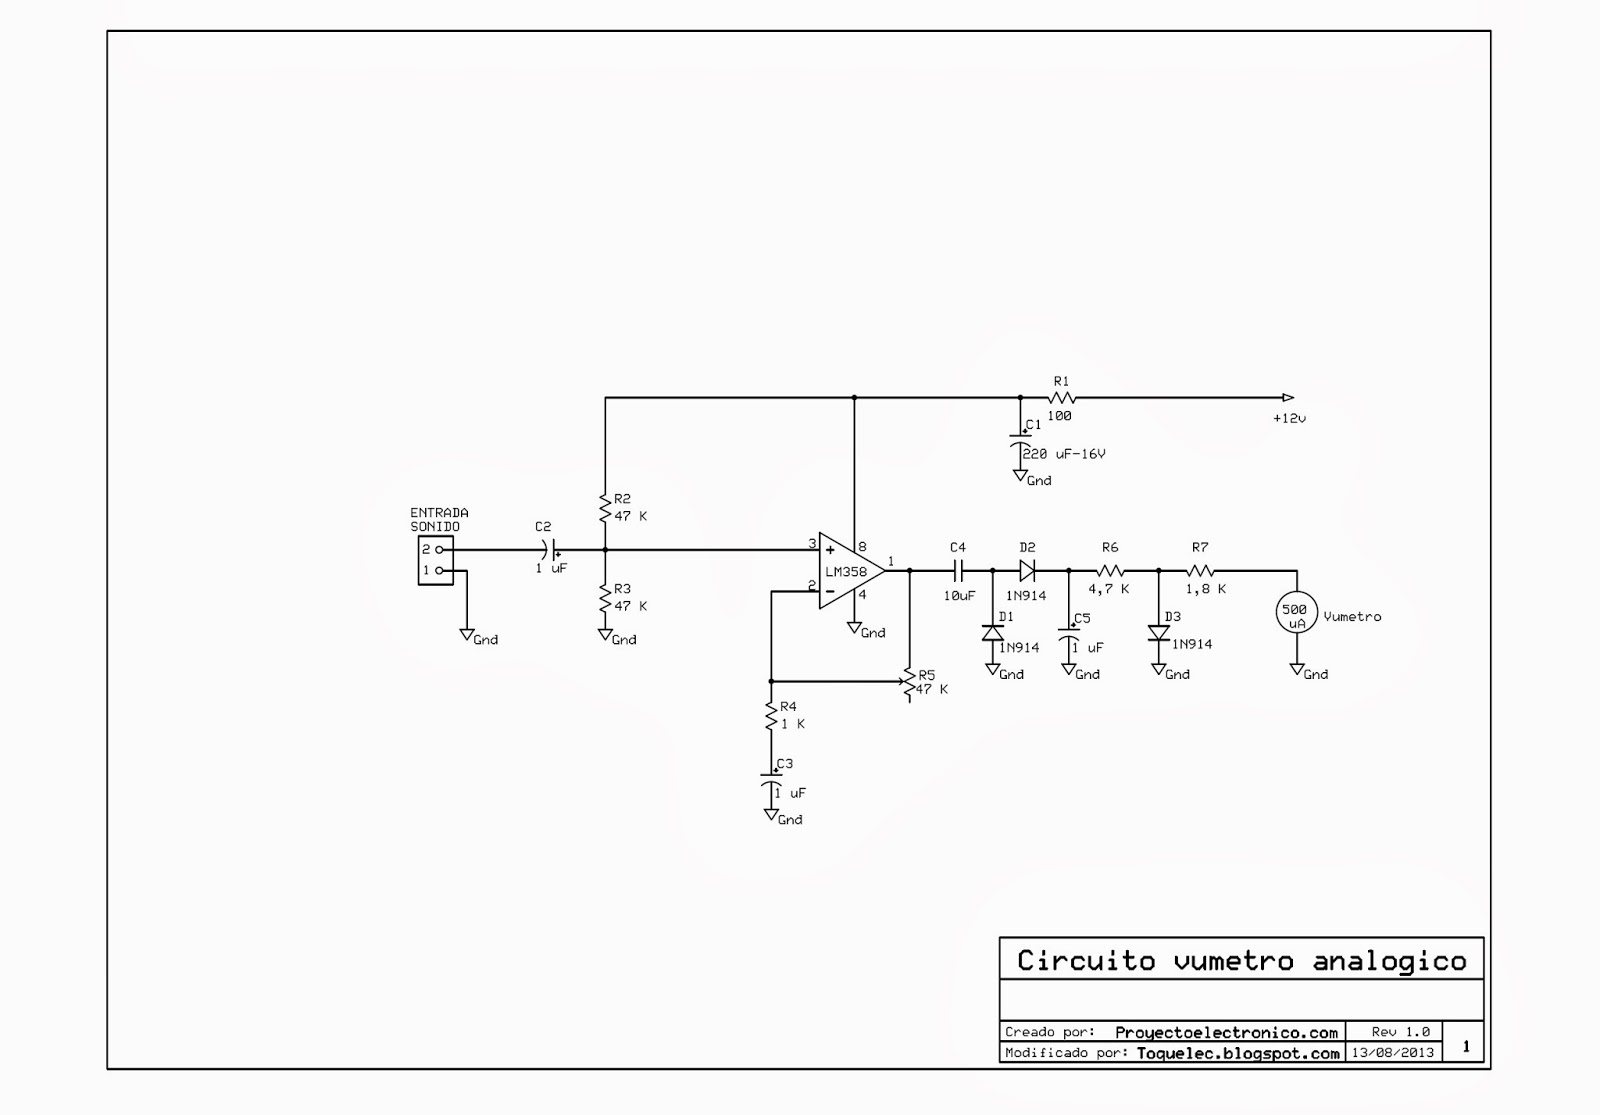 Circuito Vumetro : La ciencia de toquelec construcción un circuito para